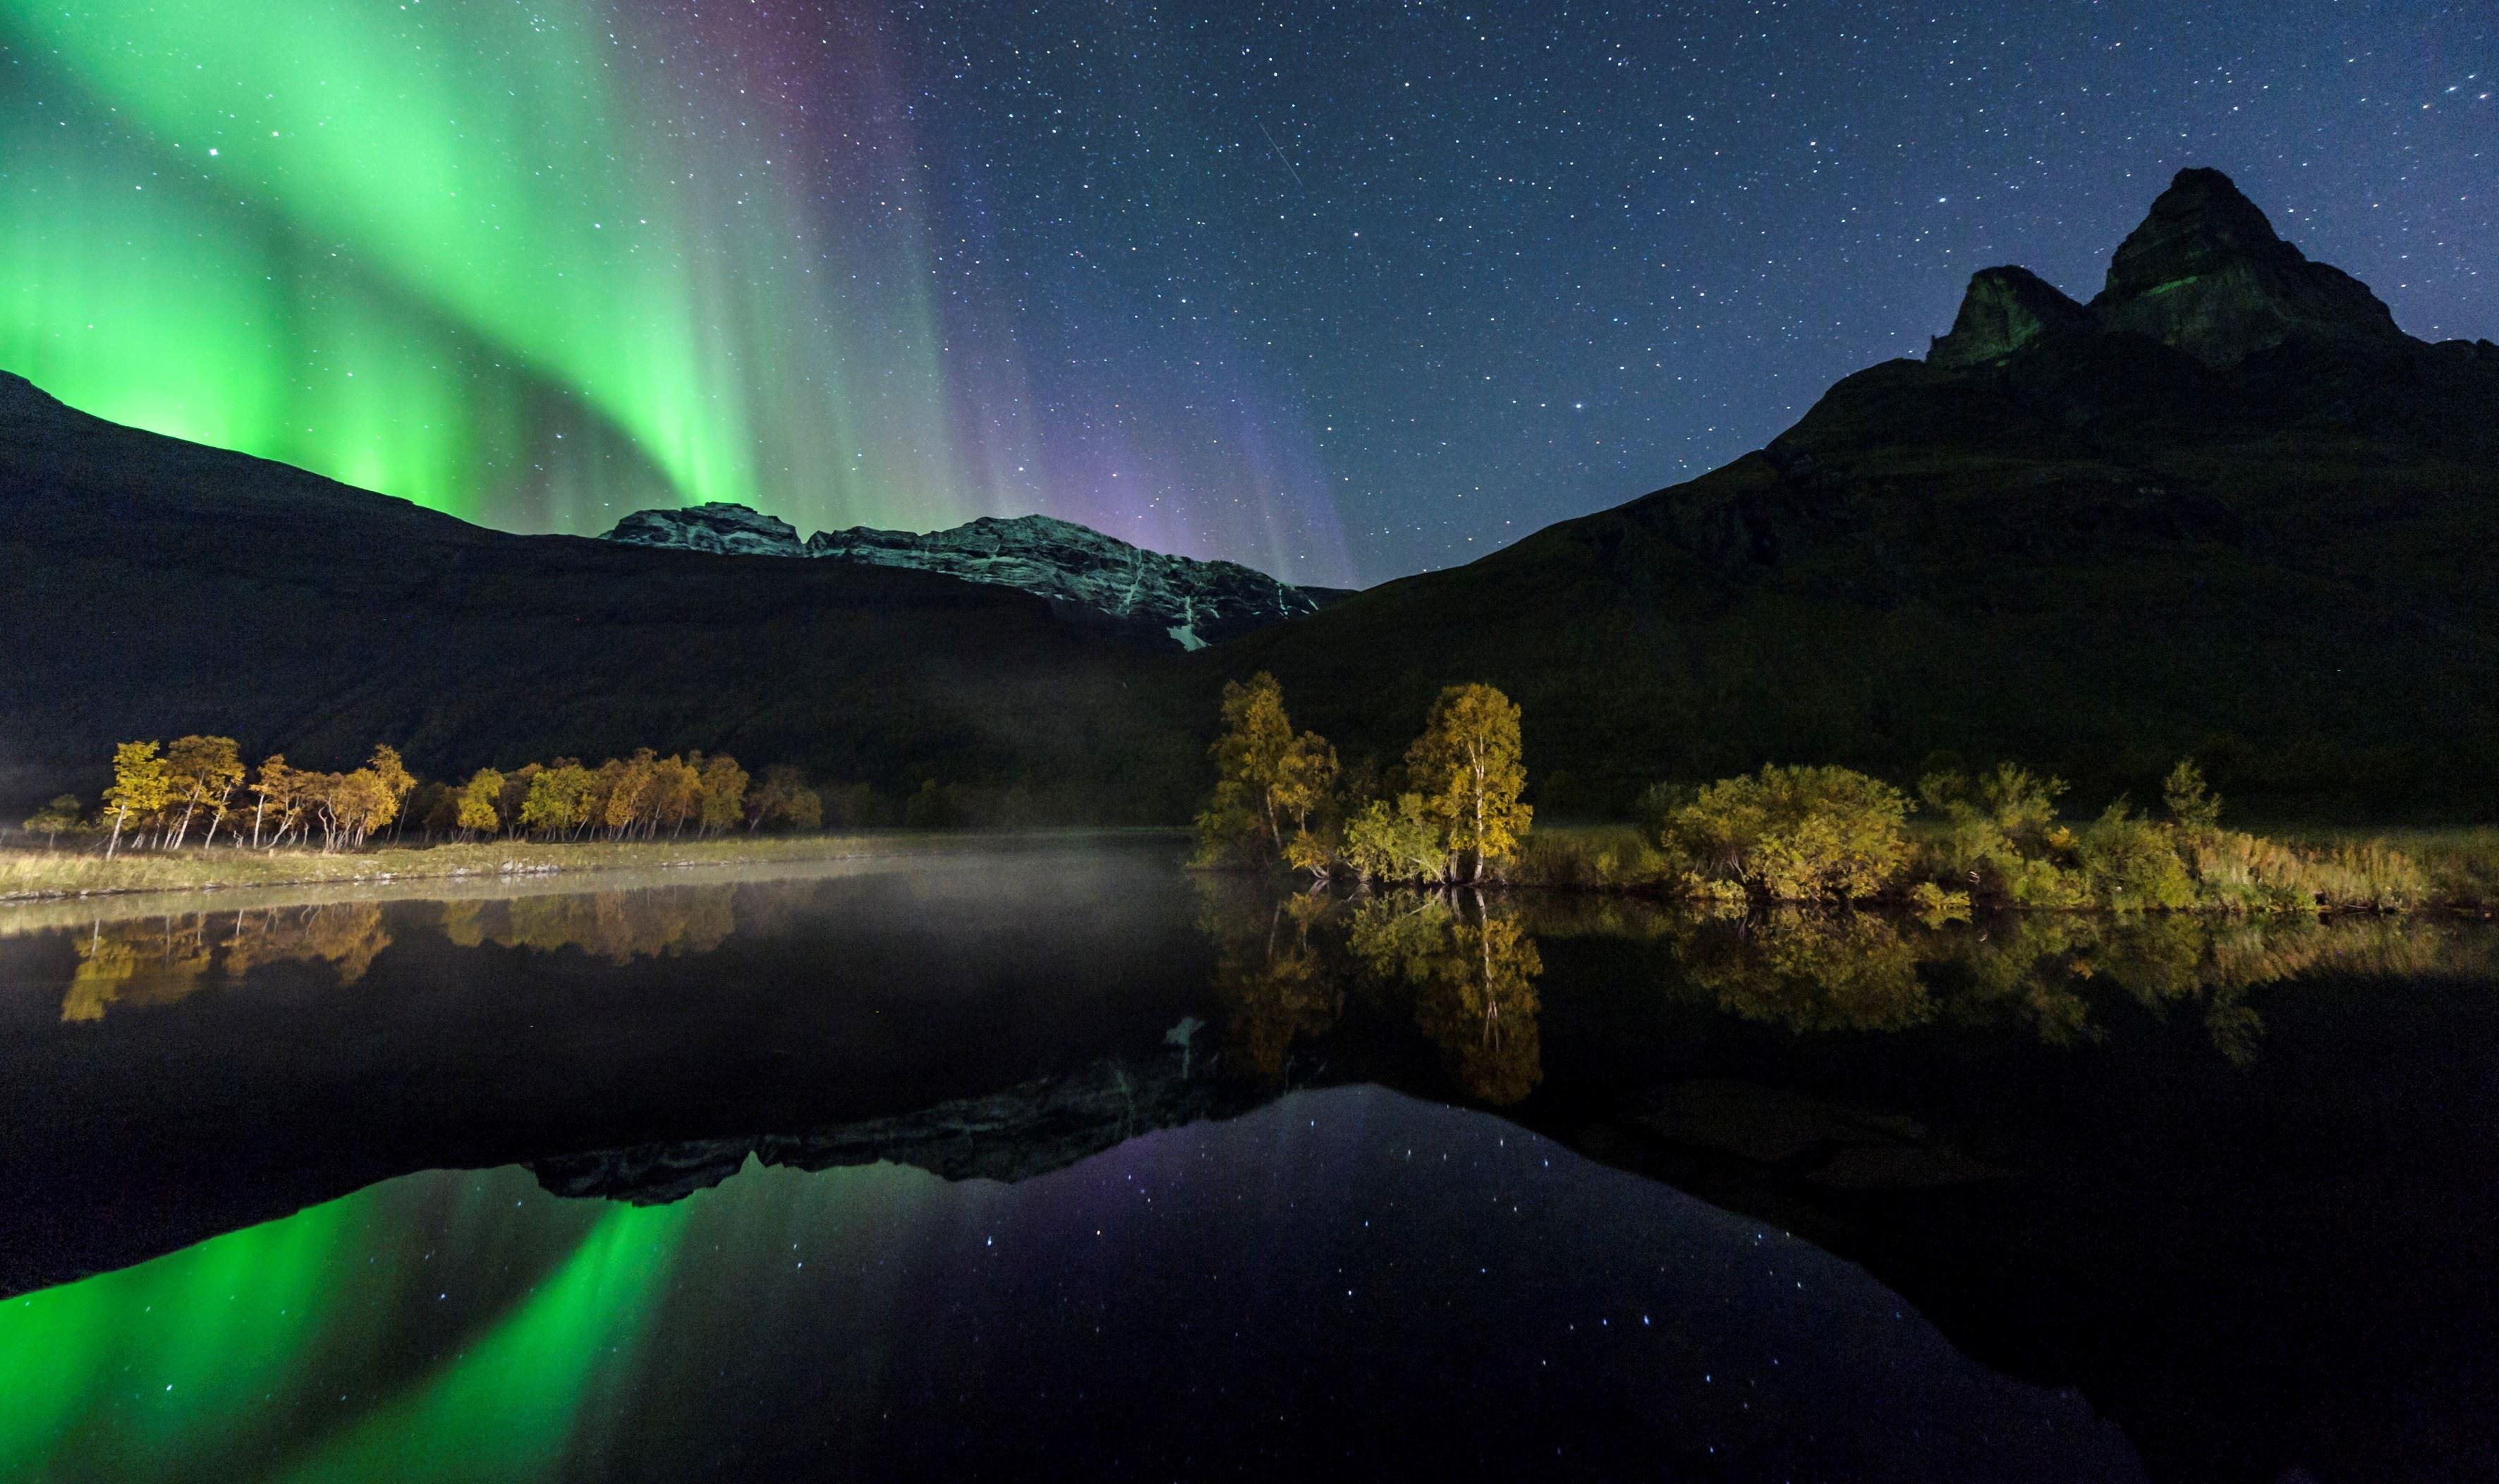 Jan R Olsen, Summer activities under the Arctic Lights